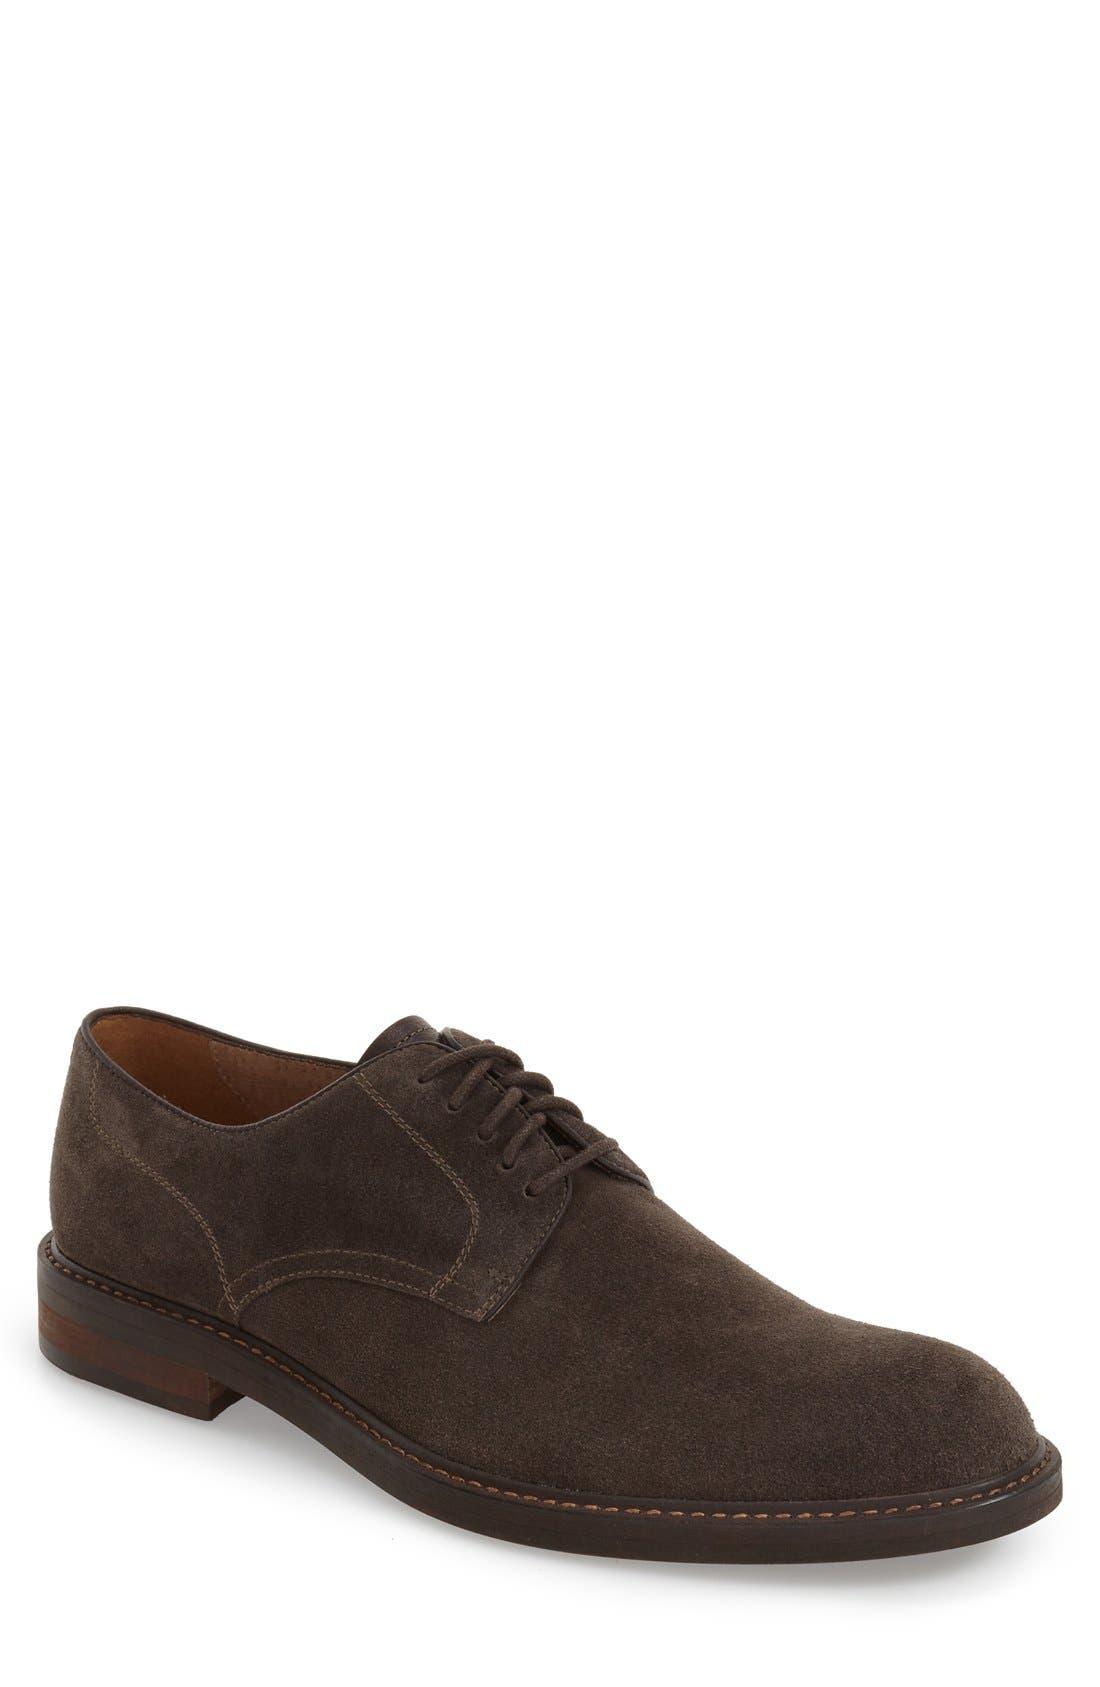 Byron Buck Shoe,                         Main,                         color, Charcoal Suede